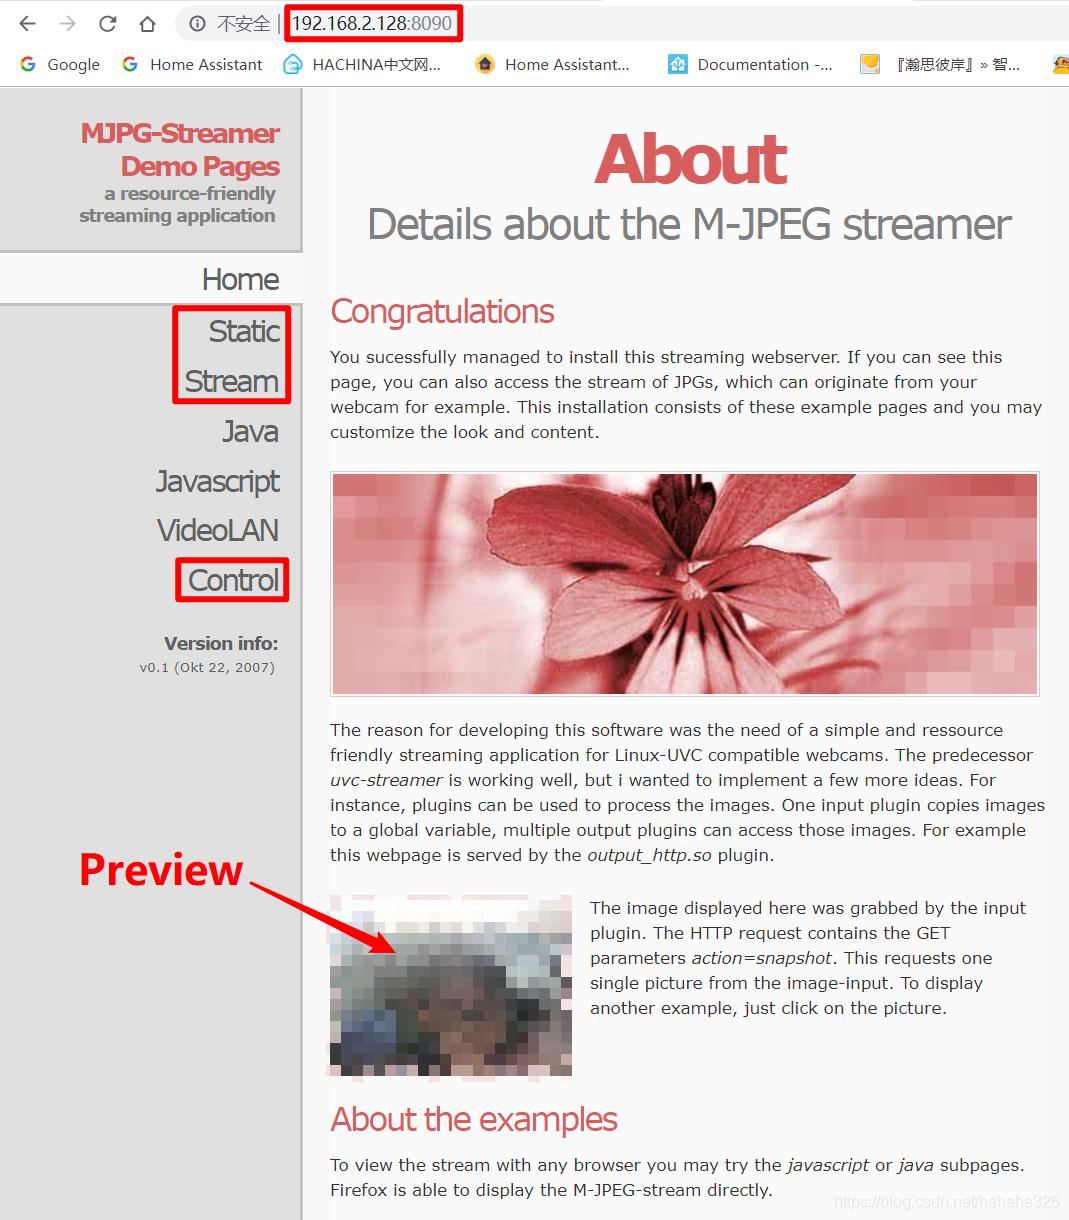 mjpeg_streamer